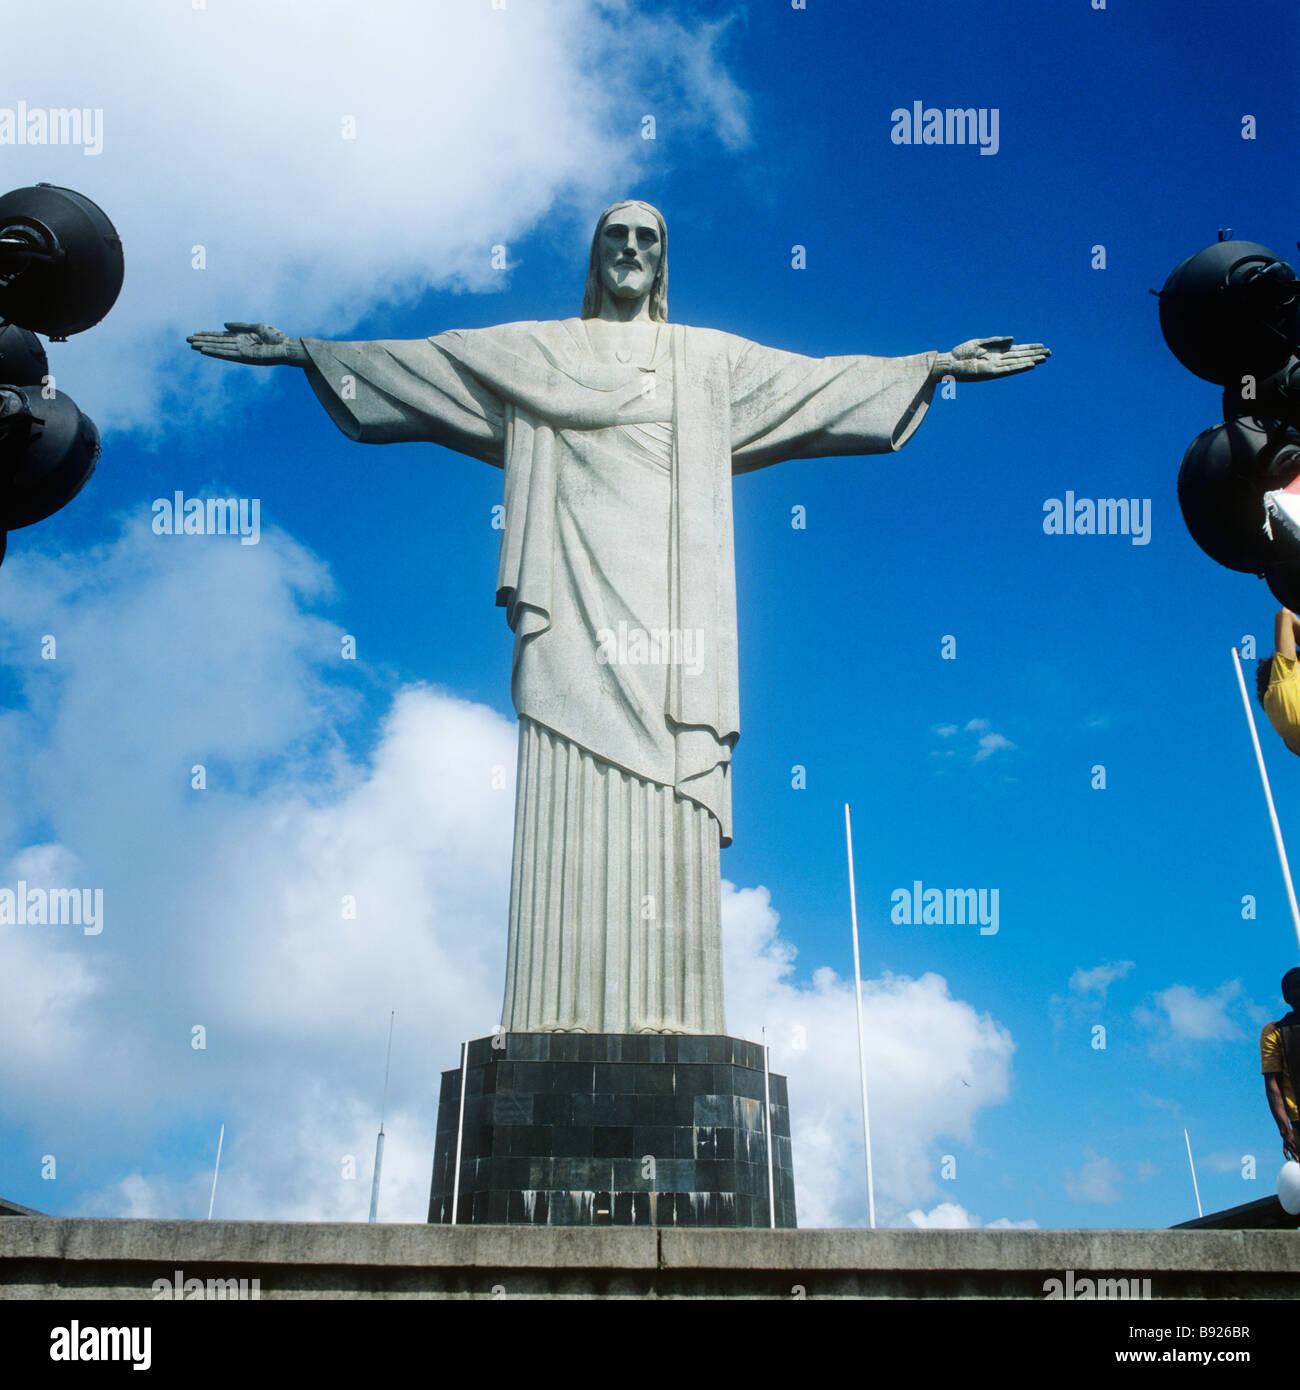 Rio de Janeiro, Brazil. The statue of Jesus Christ (Portuguese: O Cristo Redentor) on Corcovado Mt. Stock Photo